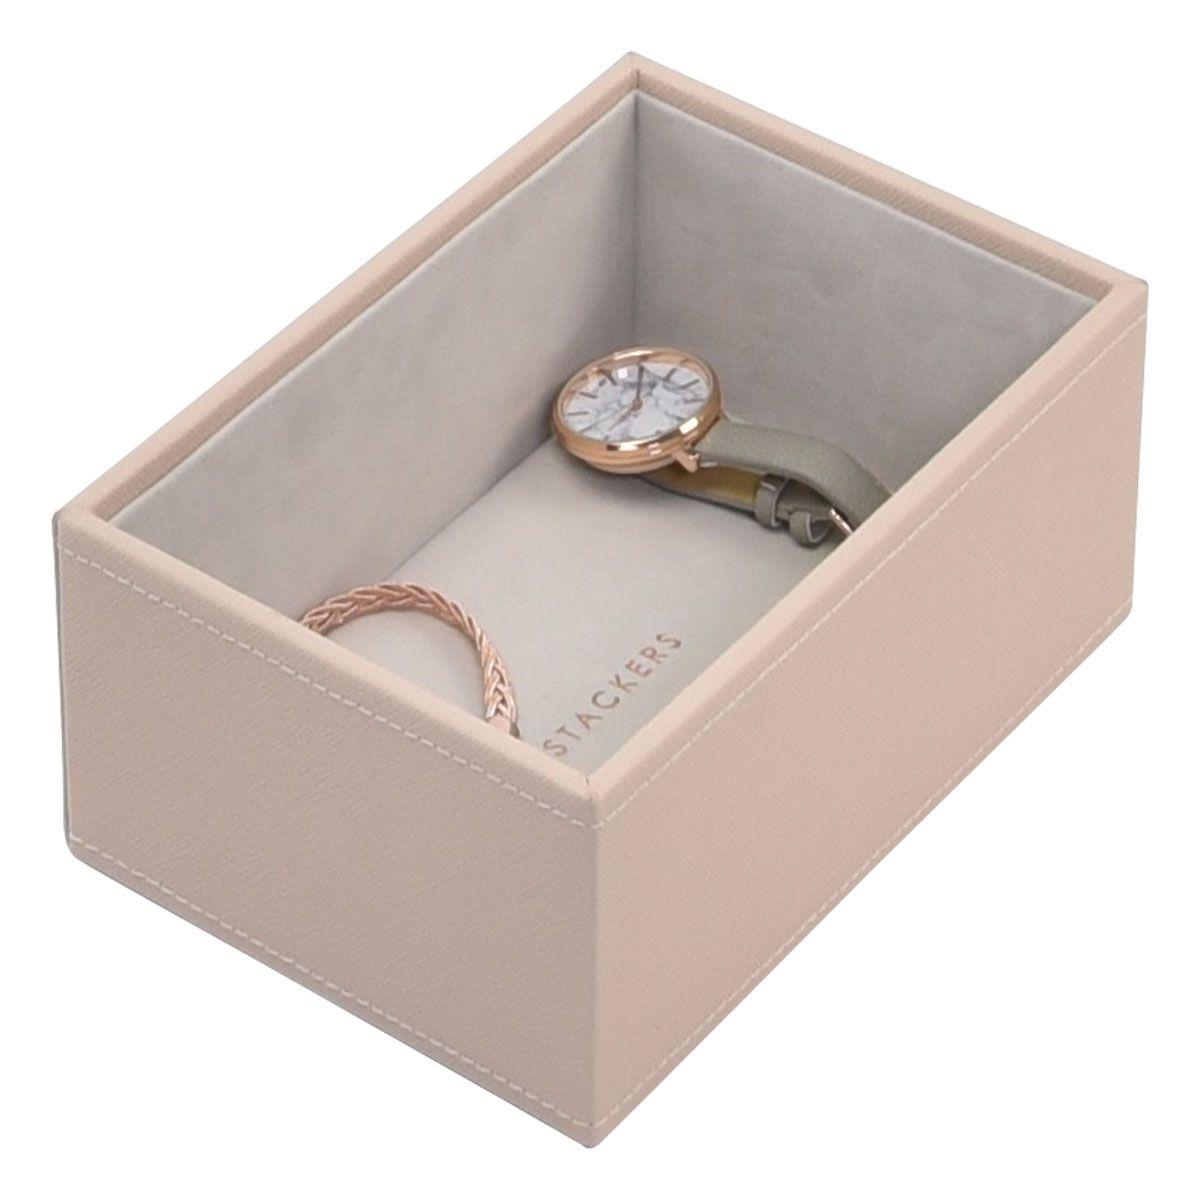 Blush Mini Watch/Accessories Layer